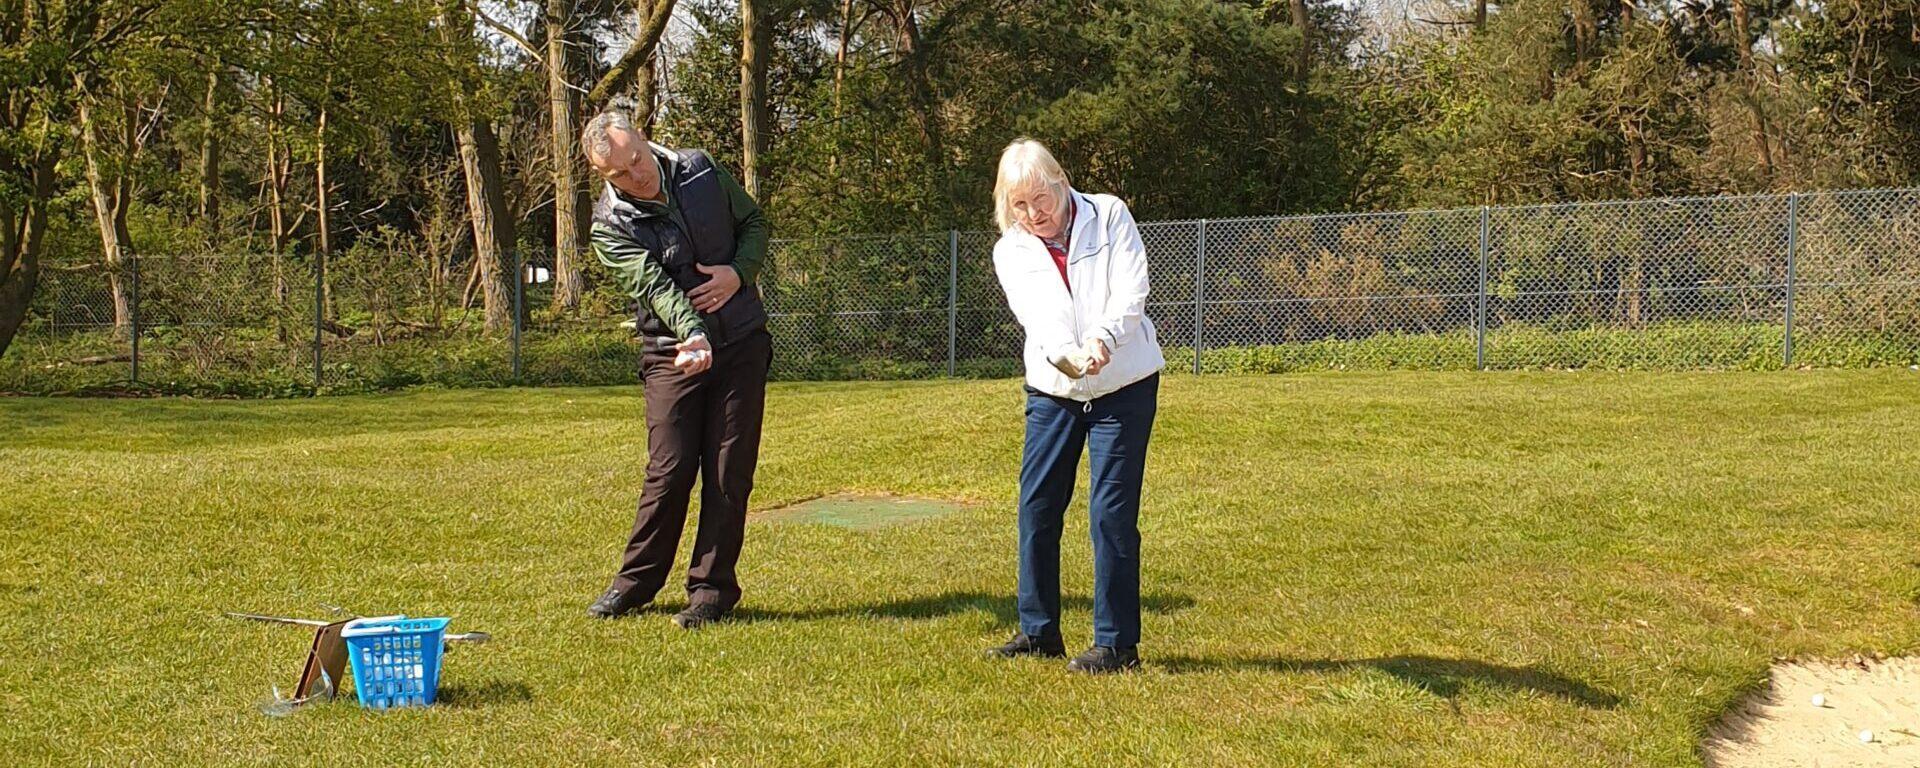 Golf Lesson Peter Field Golf Shop Norwich Norfolk